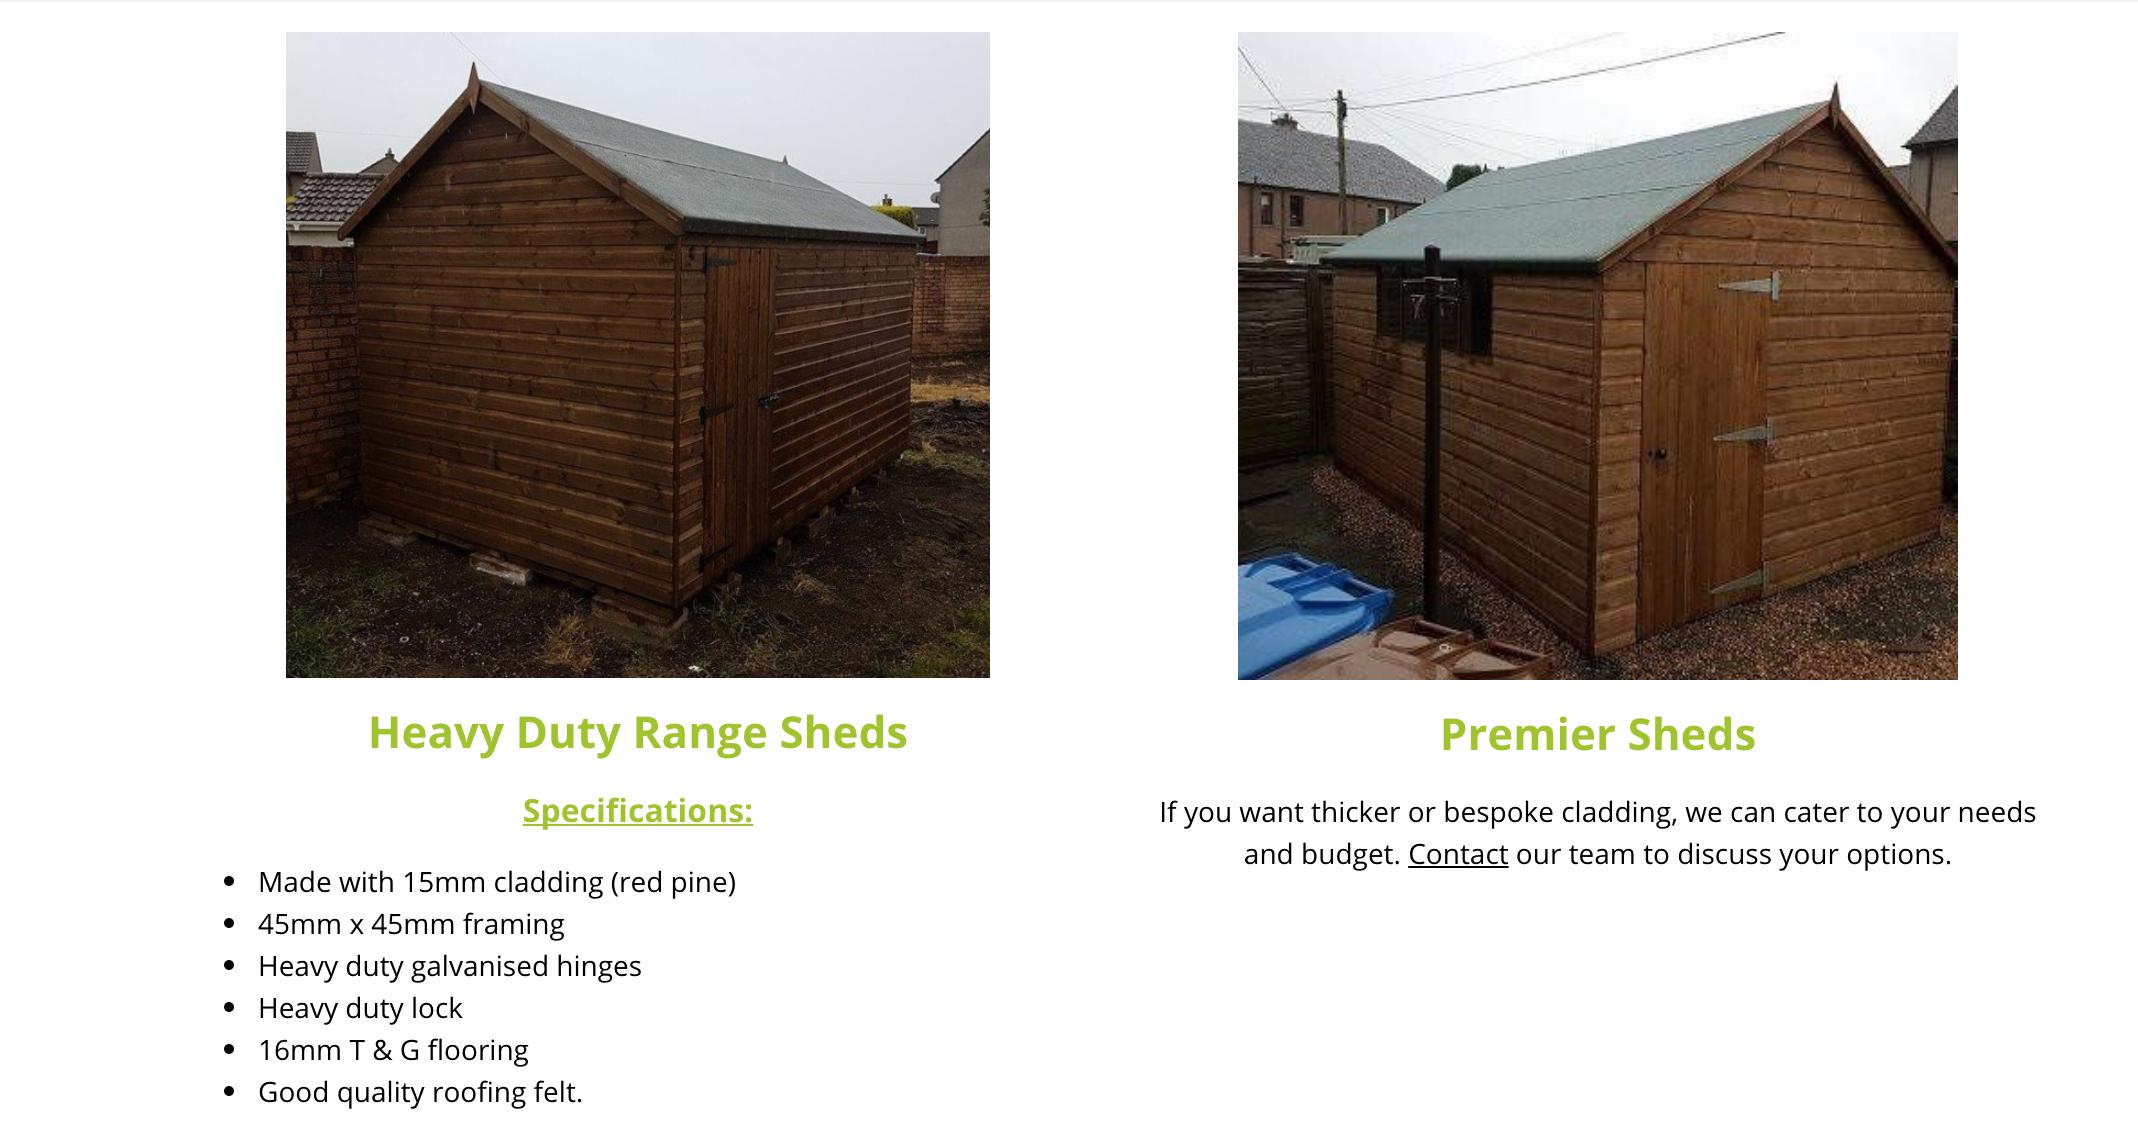 Garden sheds Fife - Central Fife Sheds